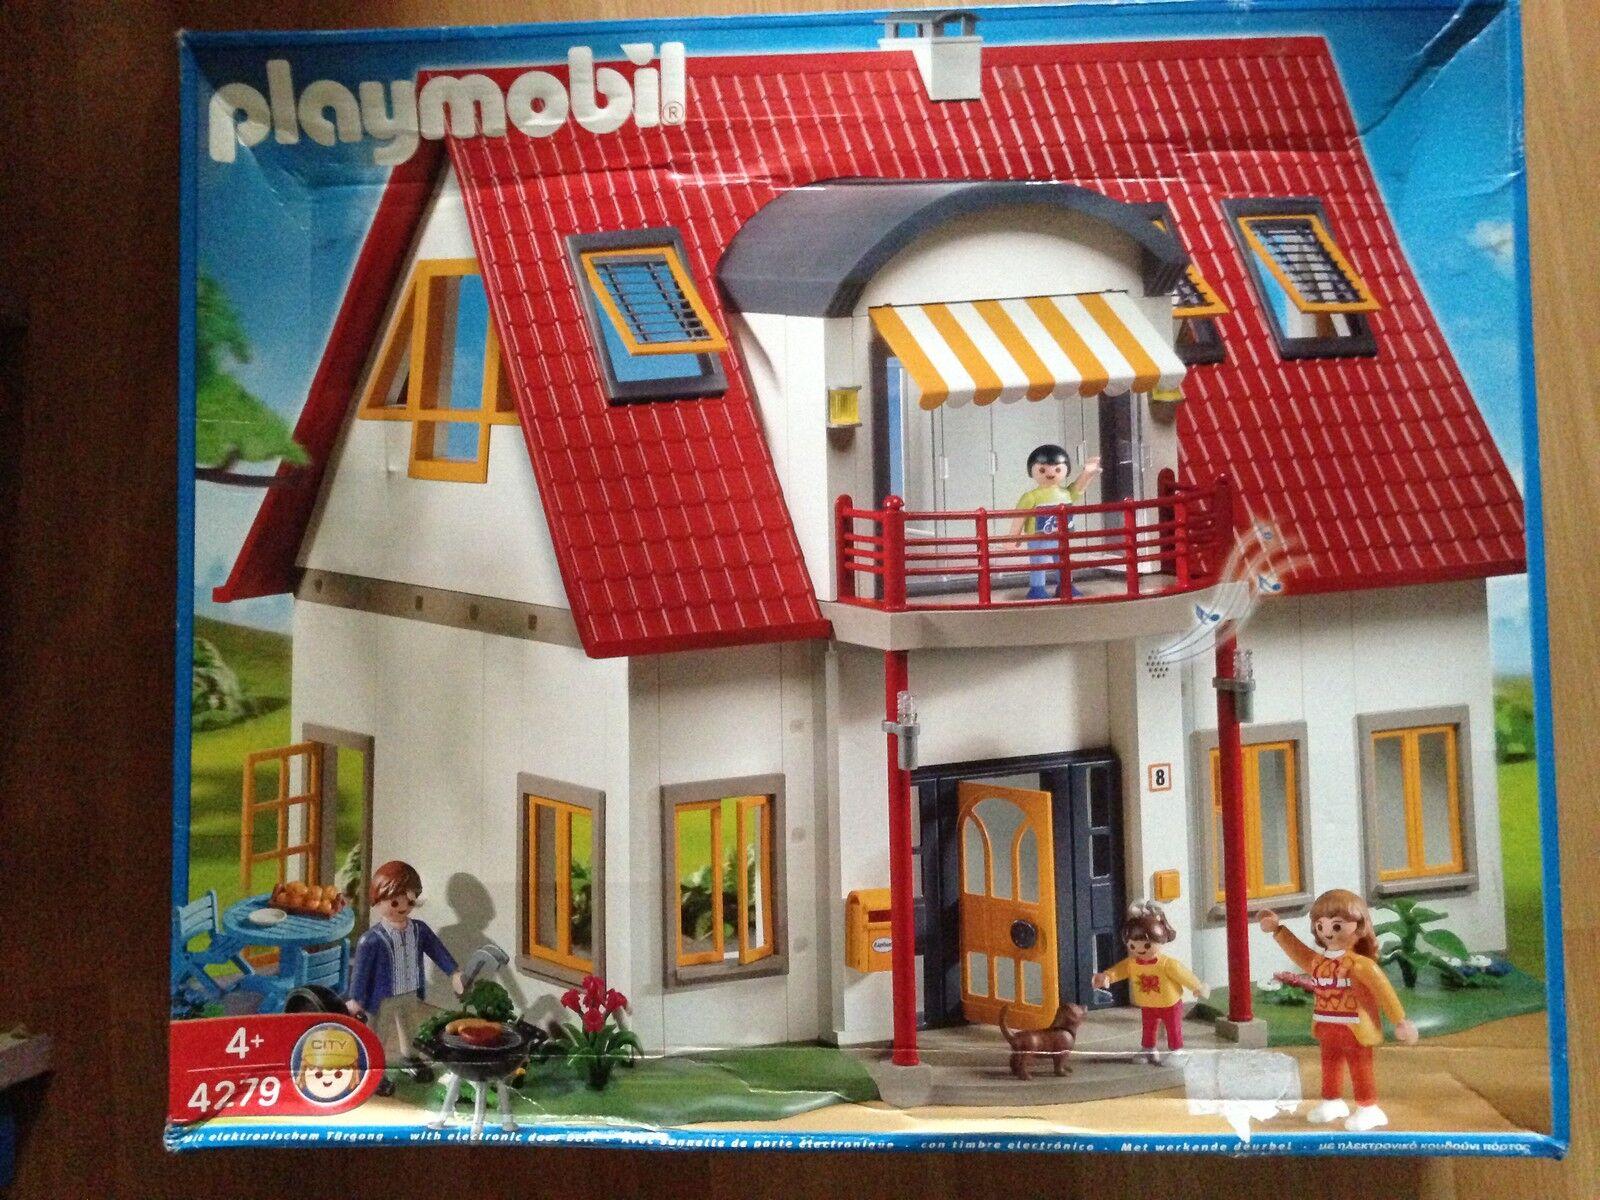 Casa Moderna Referencia 4279 Playmobil Con Embalaje Original